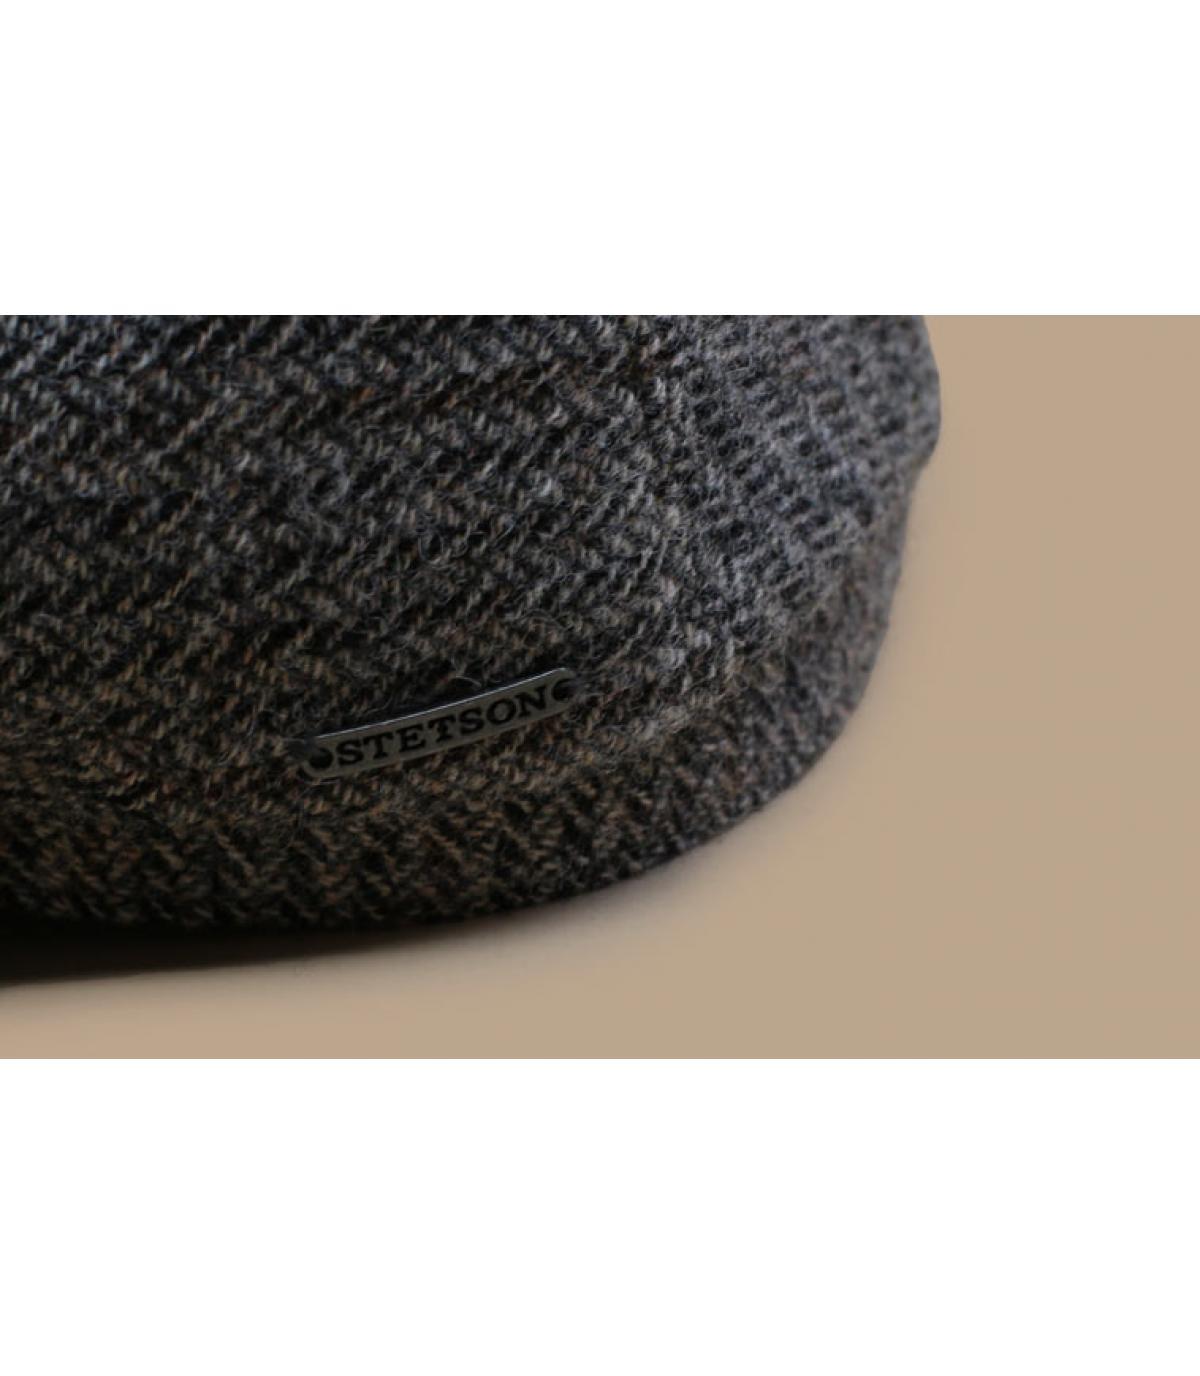 Details Driver Cap Virgin Wool Herringbone grey - Abbildung 3